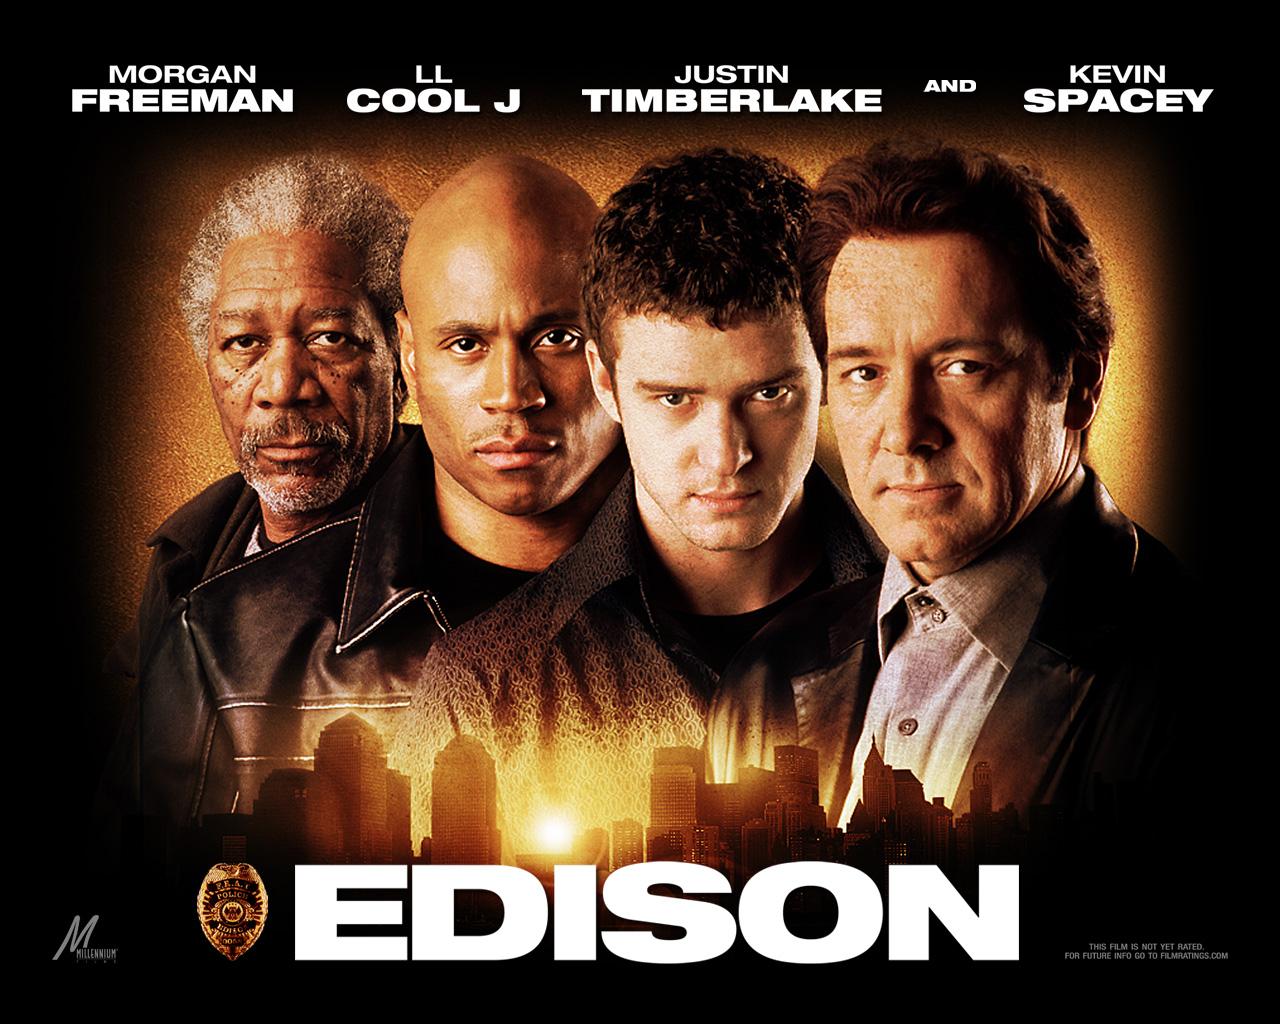 http://3.bp.blogspot.com/-24t9dXxRuzE/UBPlrfl3o0I/AAAAAAAADJM/AXJEMhnHqRo/s1600/Justin_Timberlake_in_2006_Edison_Wallpaper_2_1280.jpg